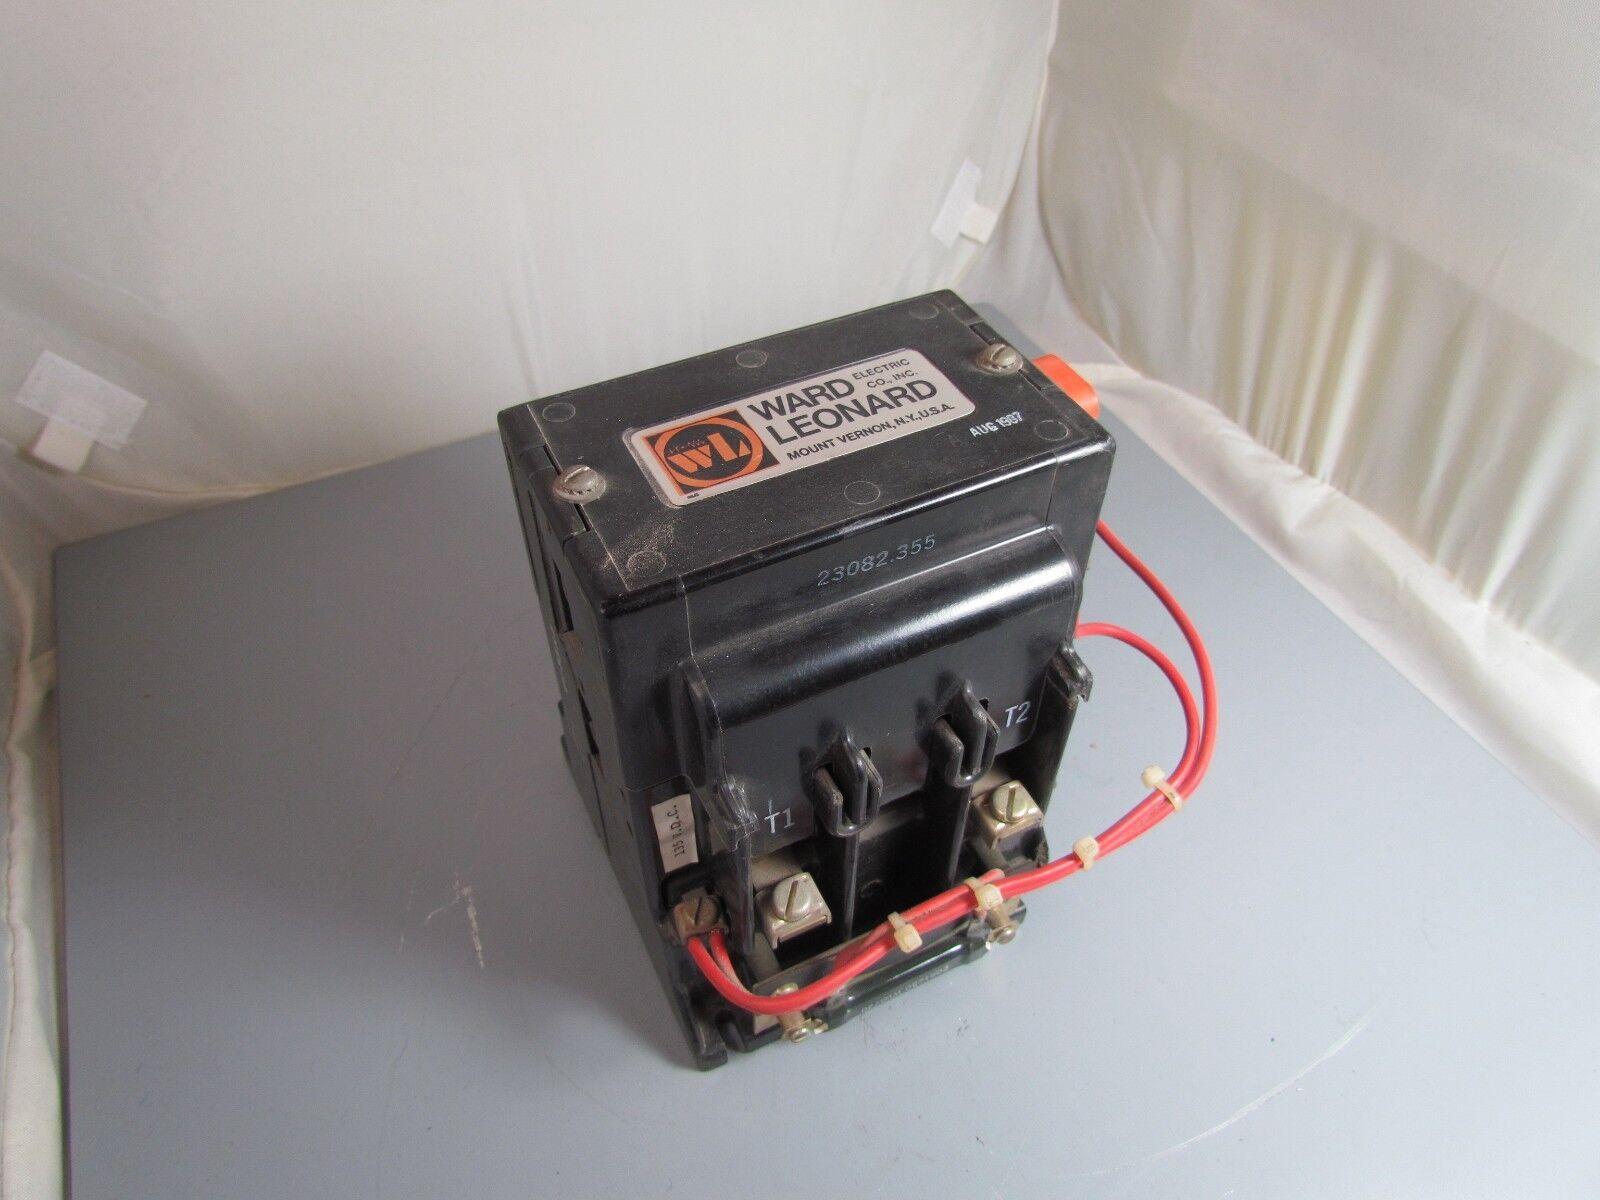 Ward Leonard Contactor, Size 1, 2 Pole, 25 amp, 235 volts DC, CatN